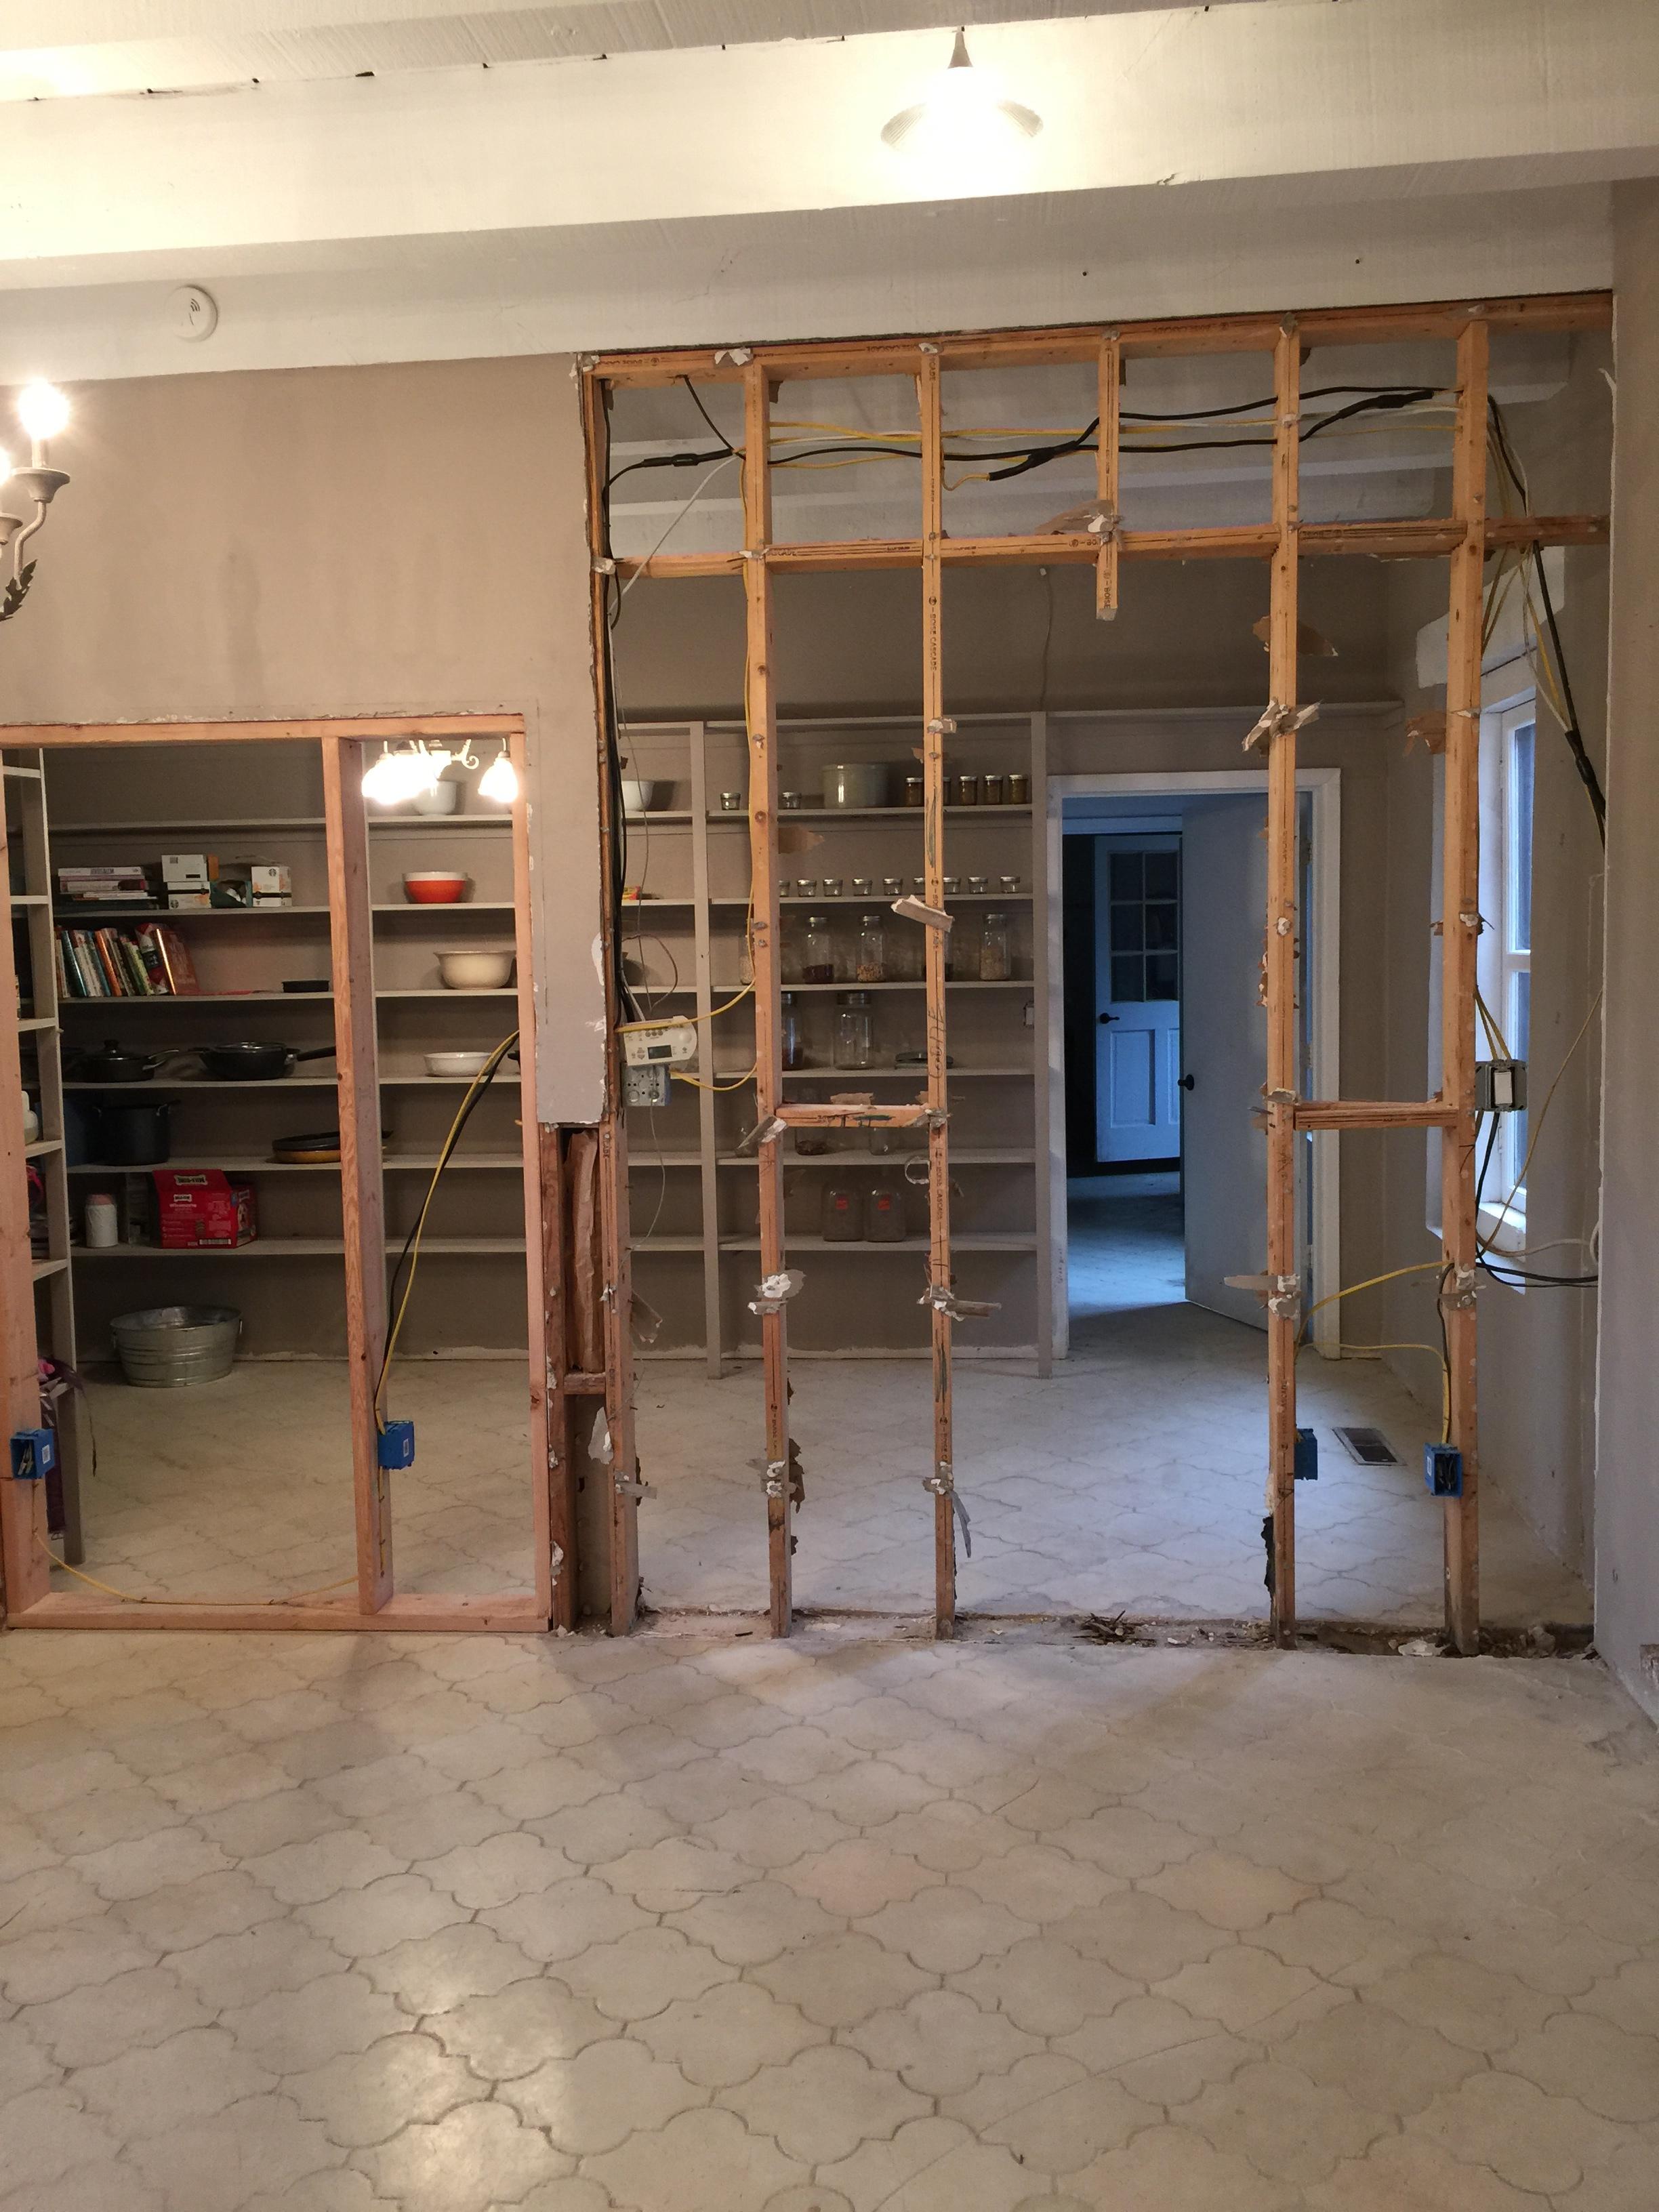 A New Mexico Farmhouse: Renovation- 2